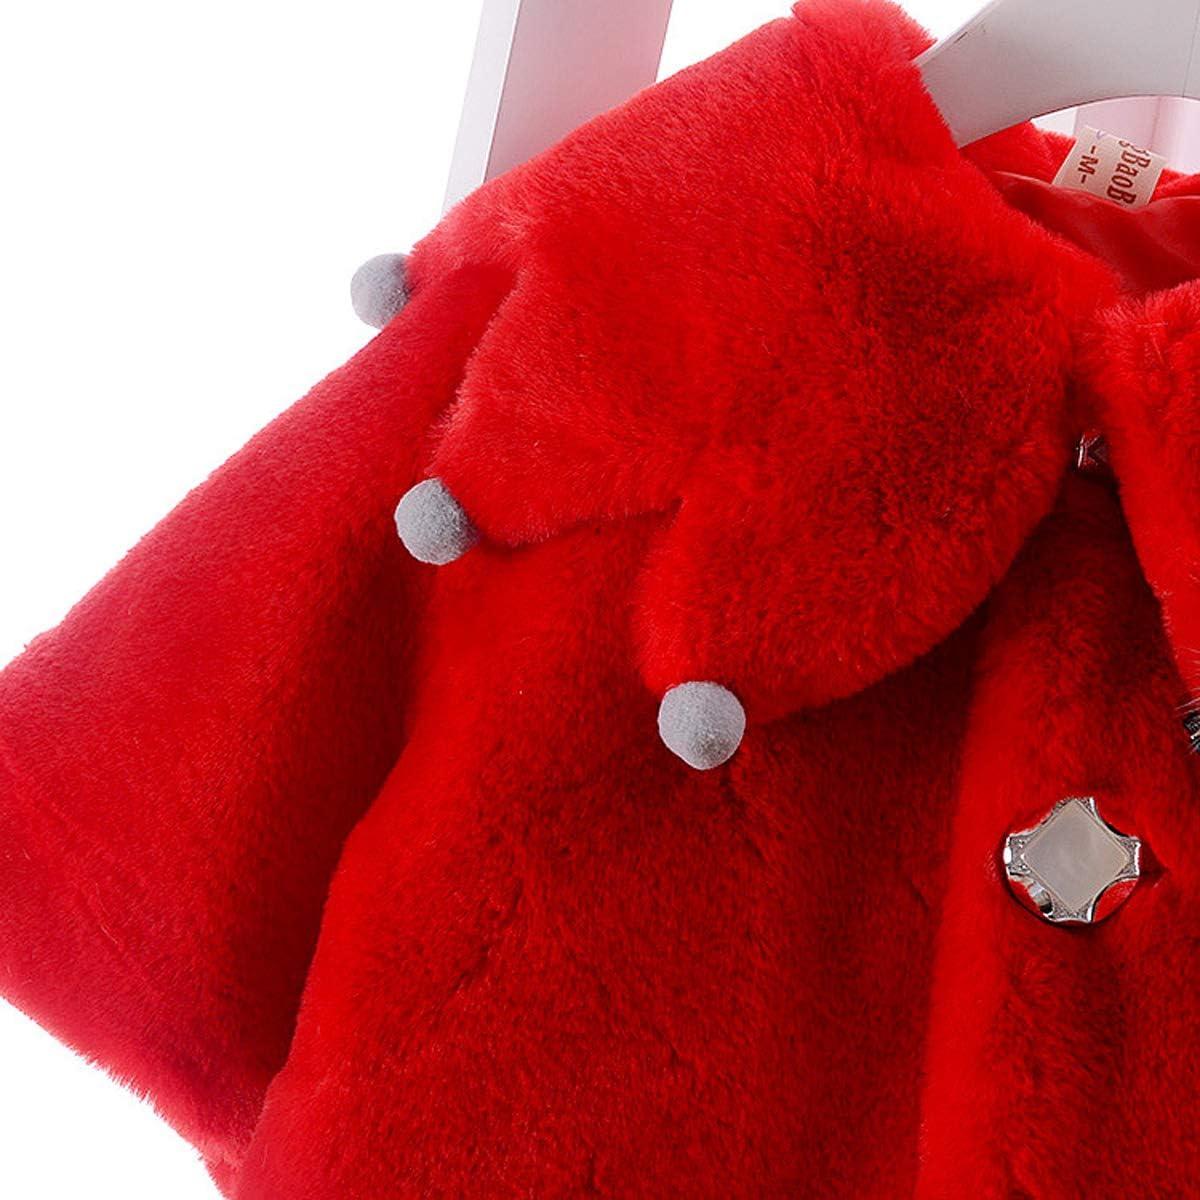 remeo suit Baby Girl Octopus Collar Warm Thick Fleece Jacket Coat Winter Outwear